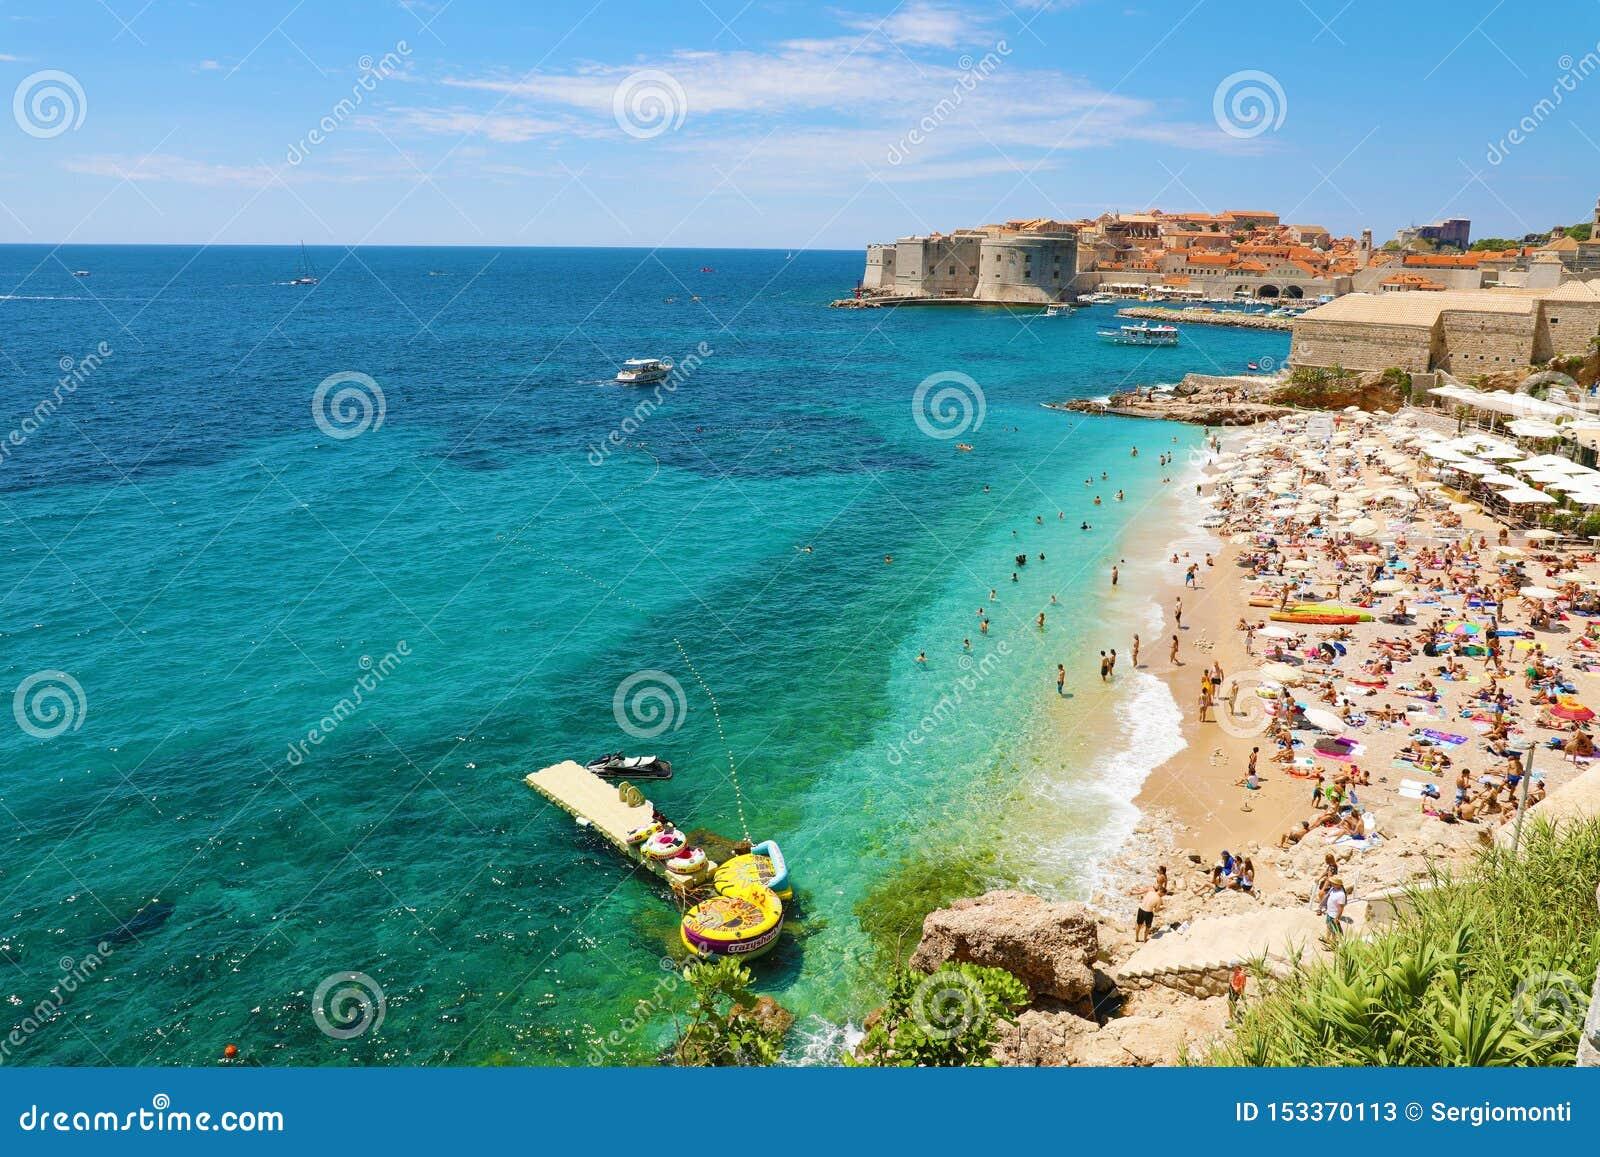 DUBROVNIK, CROATIA - JULY 12, 2019: Aerial view of Dubrovnik old town and Banje beach, Adriatic sea